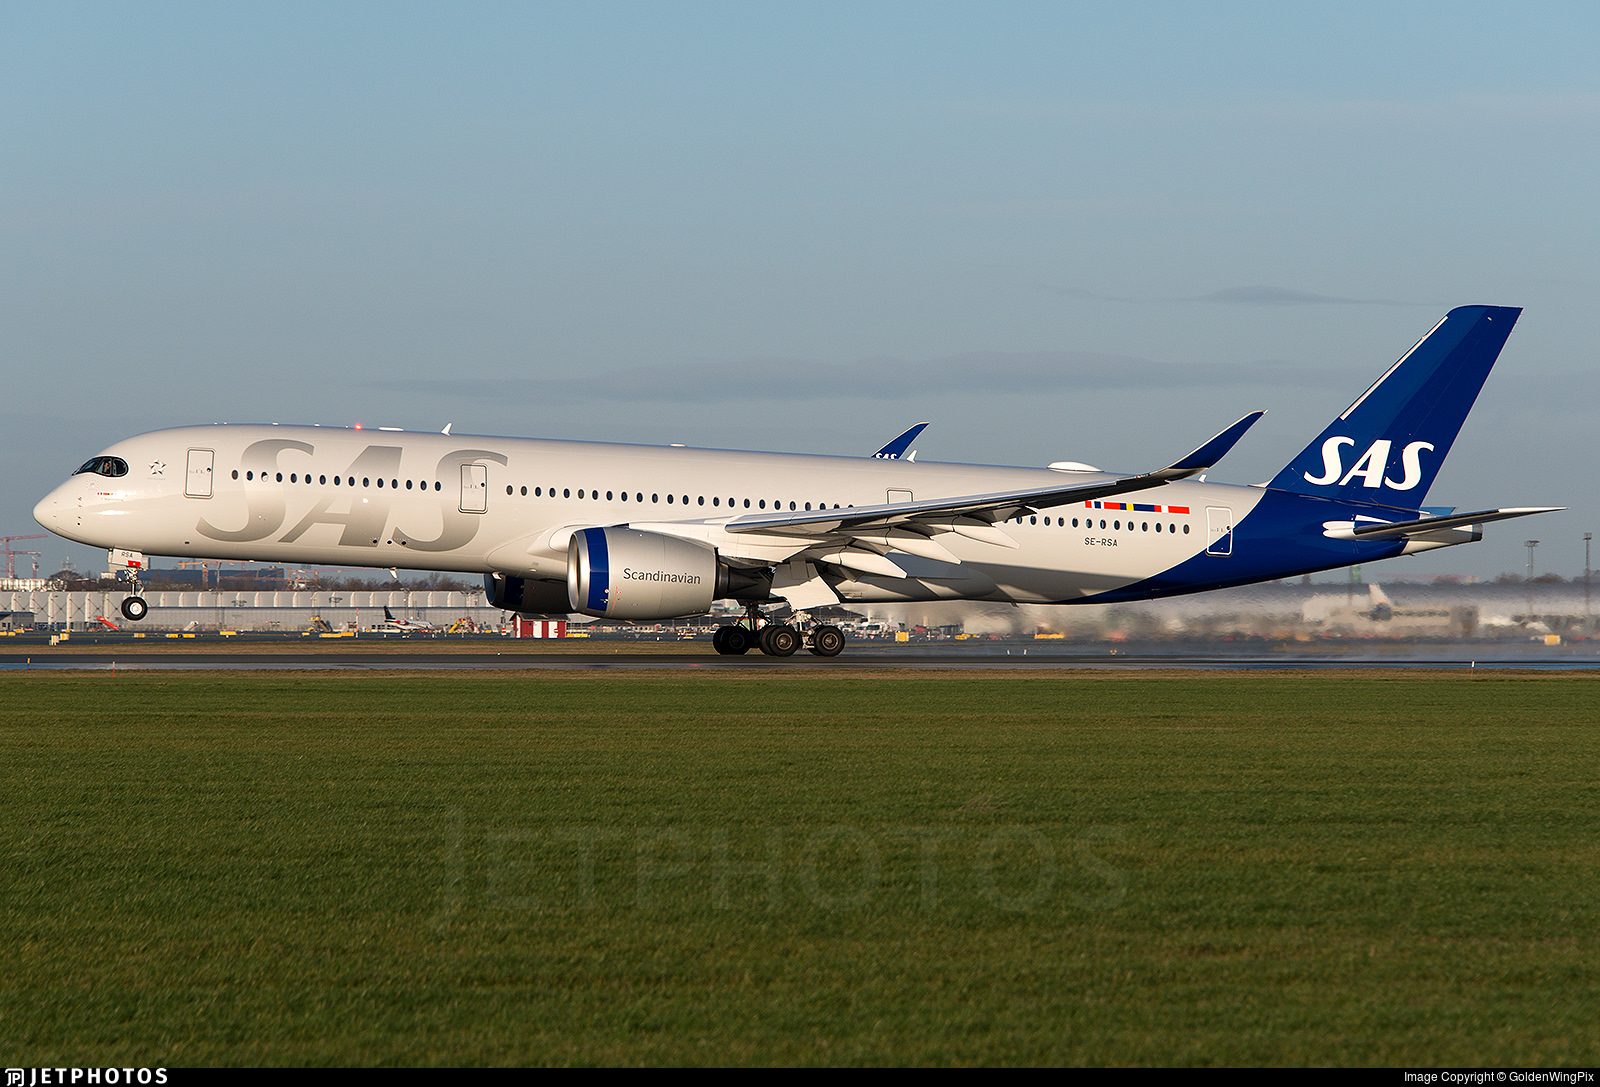 Onboard The Inaugural Sas A350 Flight From Copenhagen To Chicago Flightradar24 Blog